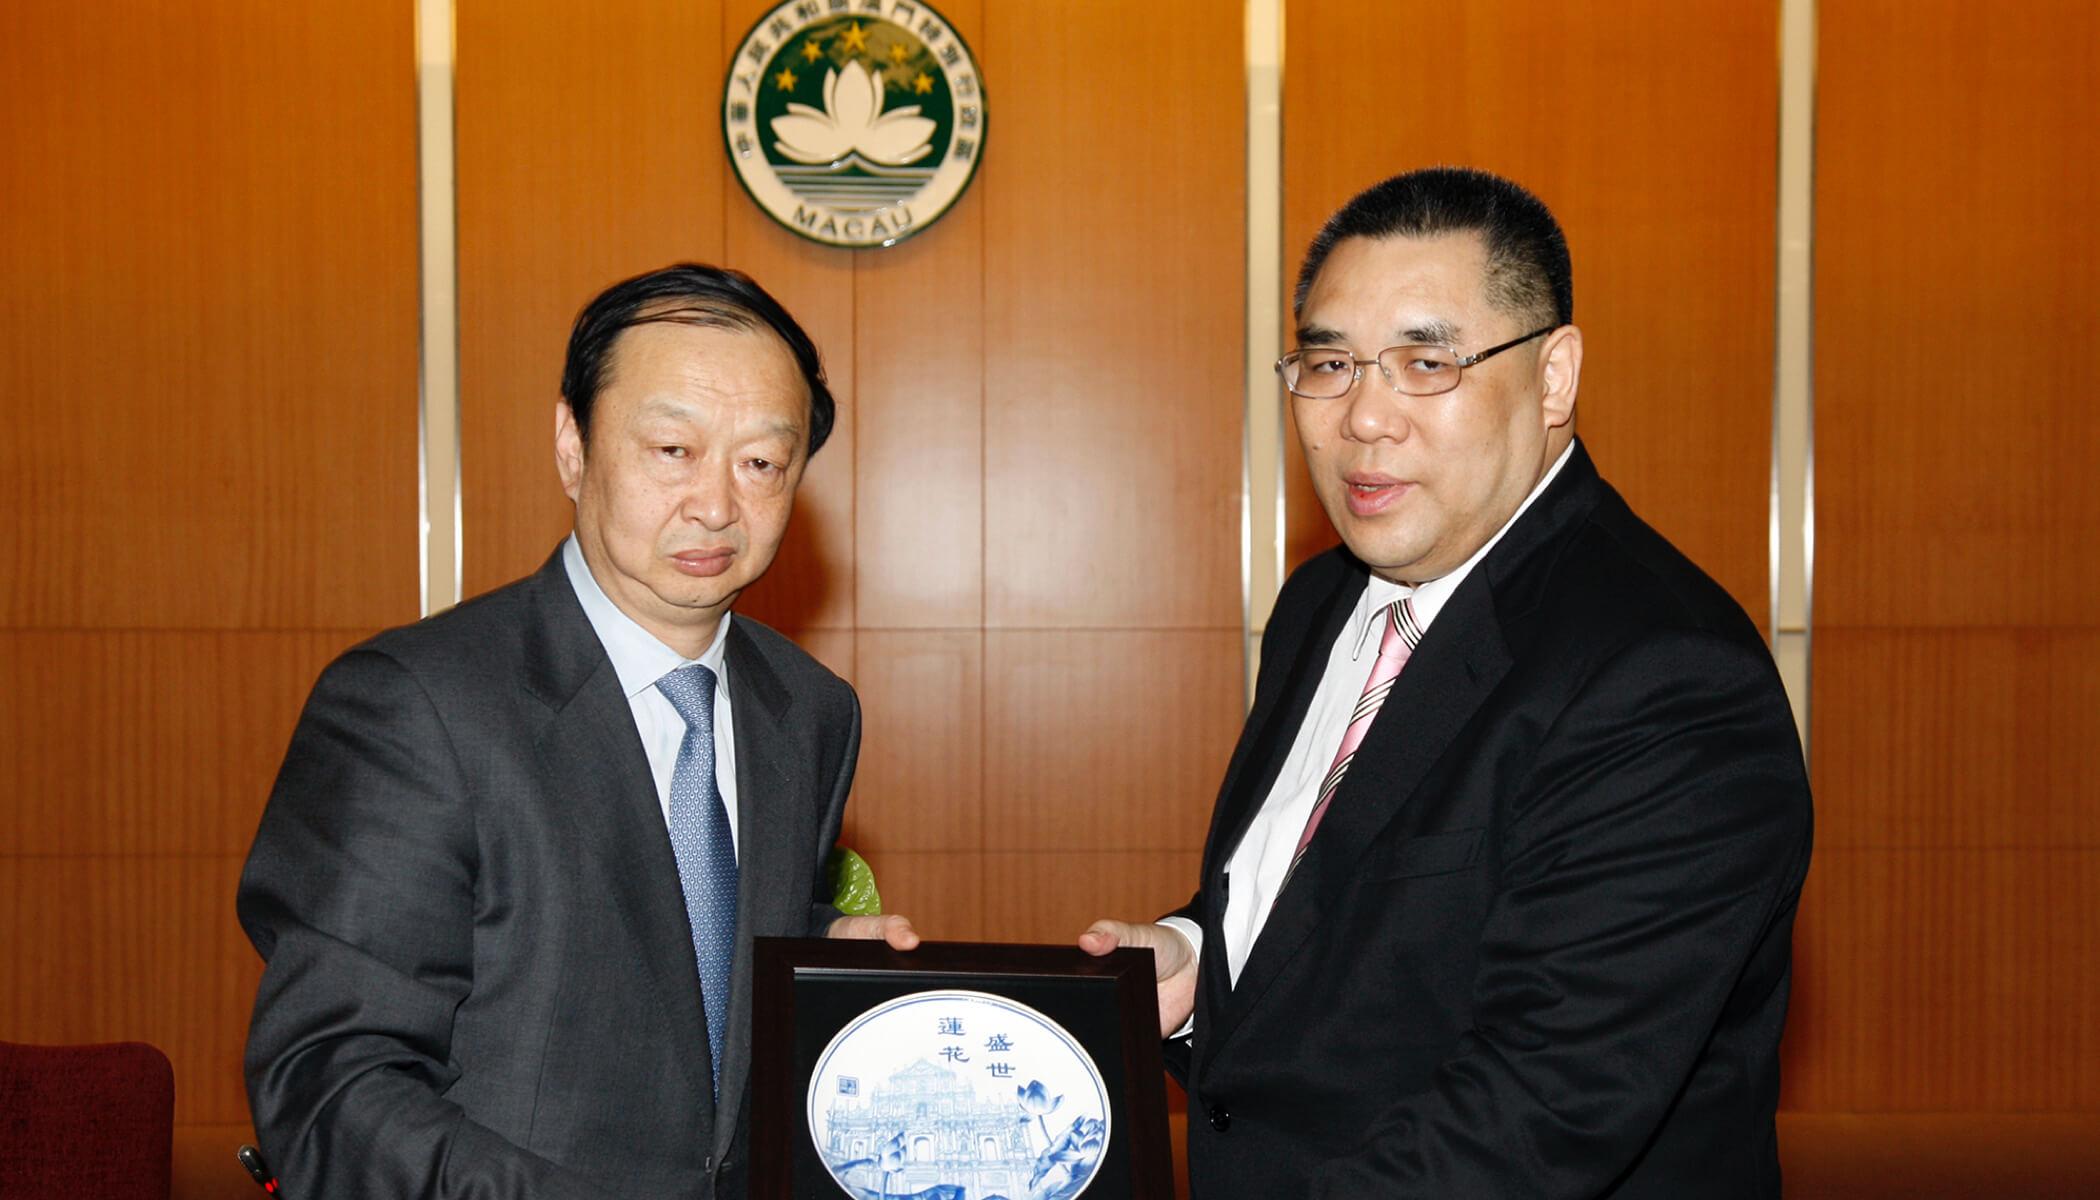 Major Shareholder | CITIC Telecom International Holdings Limited